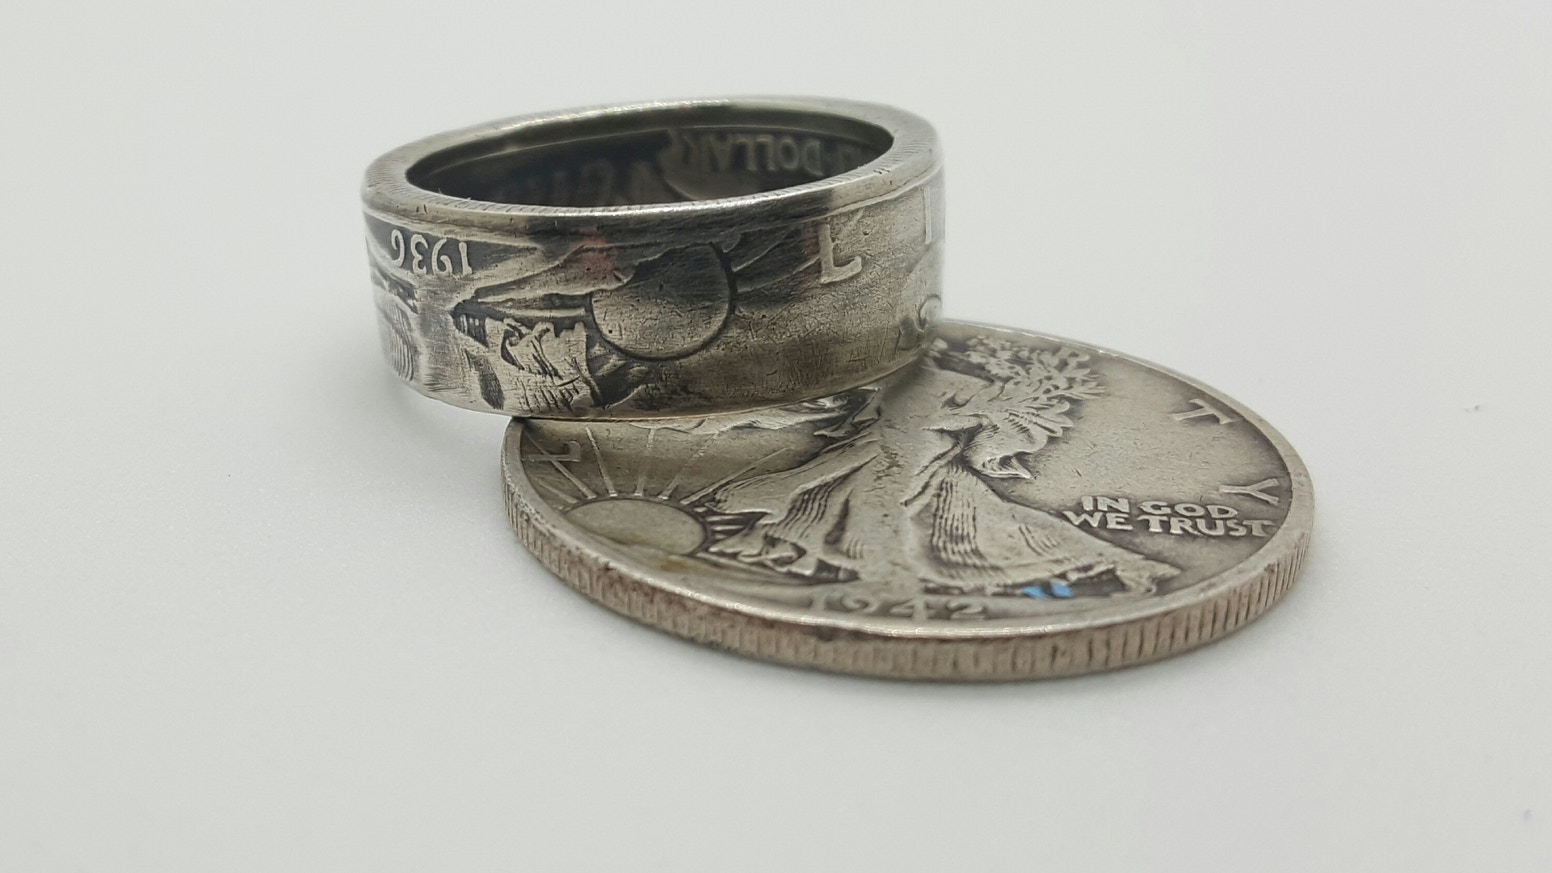 abdb8094fcf1f Veteran made, Vintage Walking Liberty Coin Ring by Adam Reuter ...